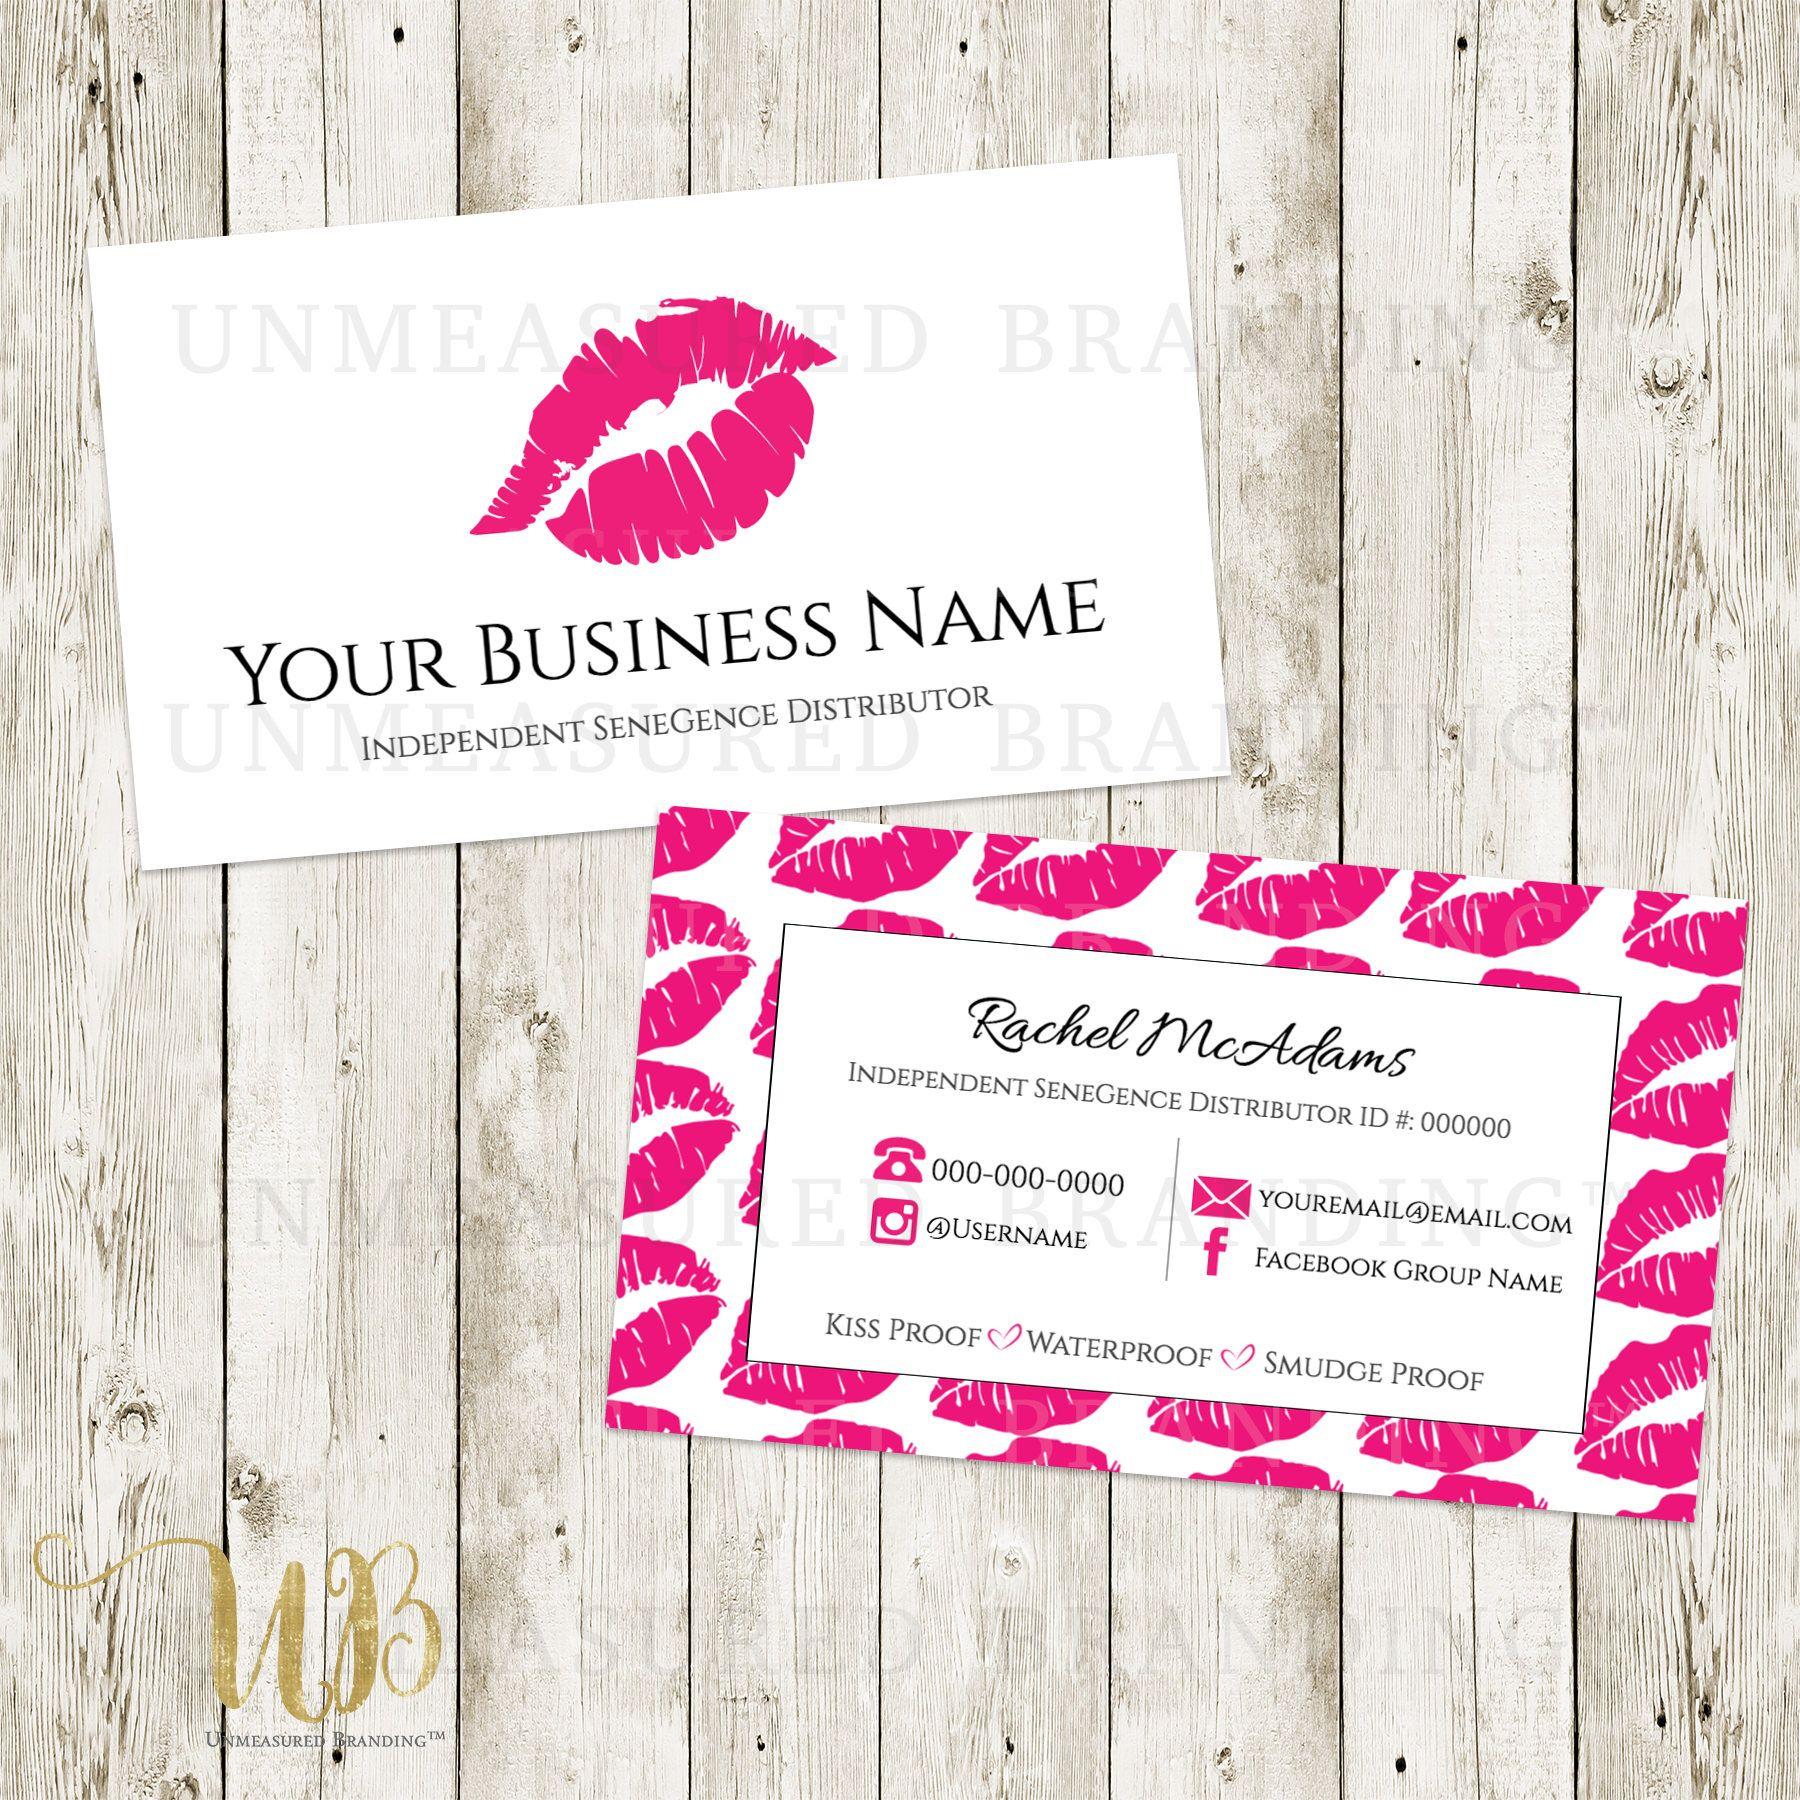 lipsense business cards senegence business cards makeup business